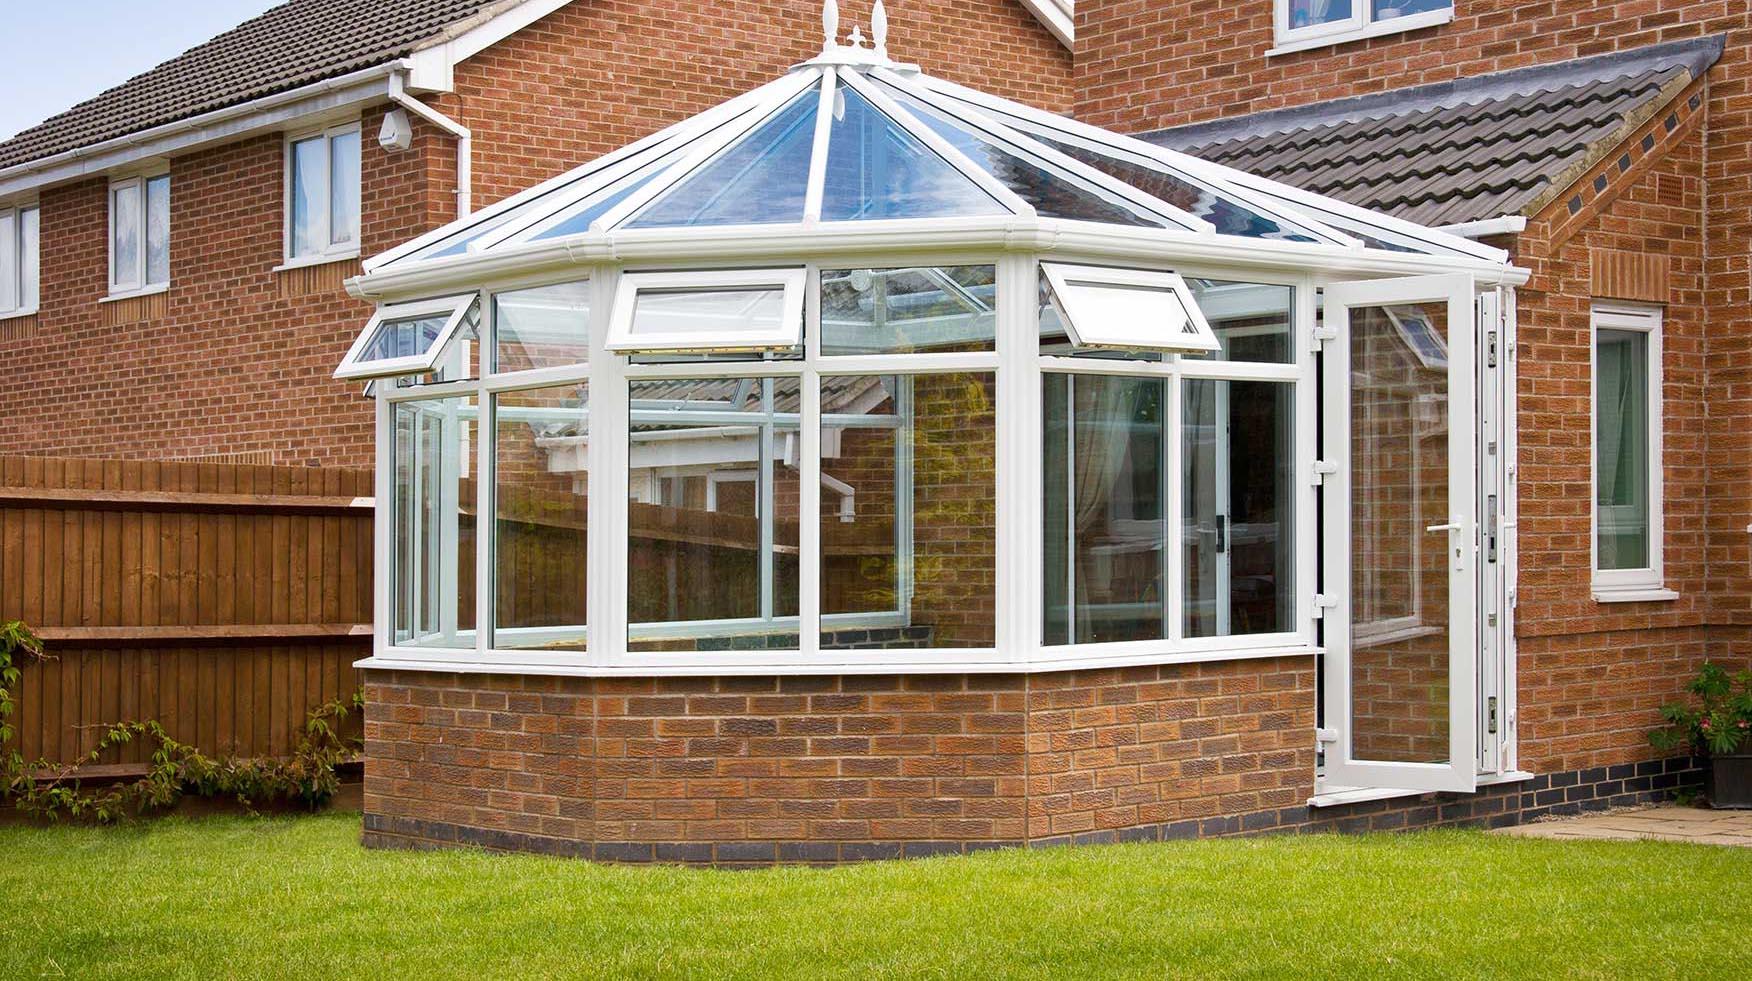 Conservatory Glazing uPVC